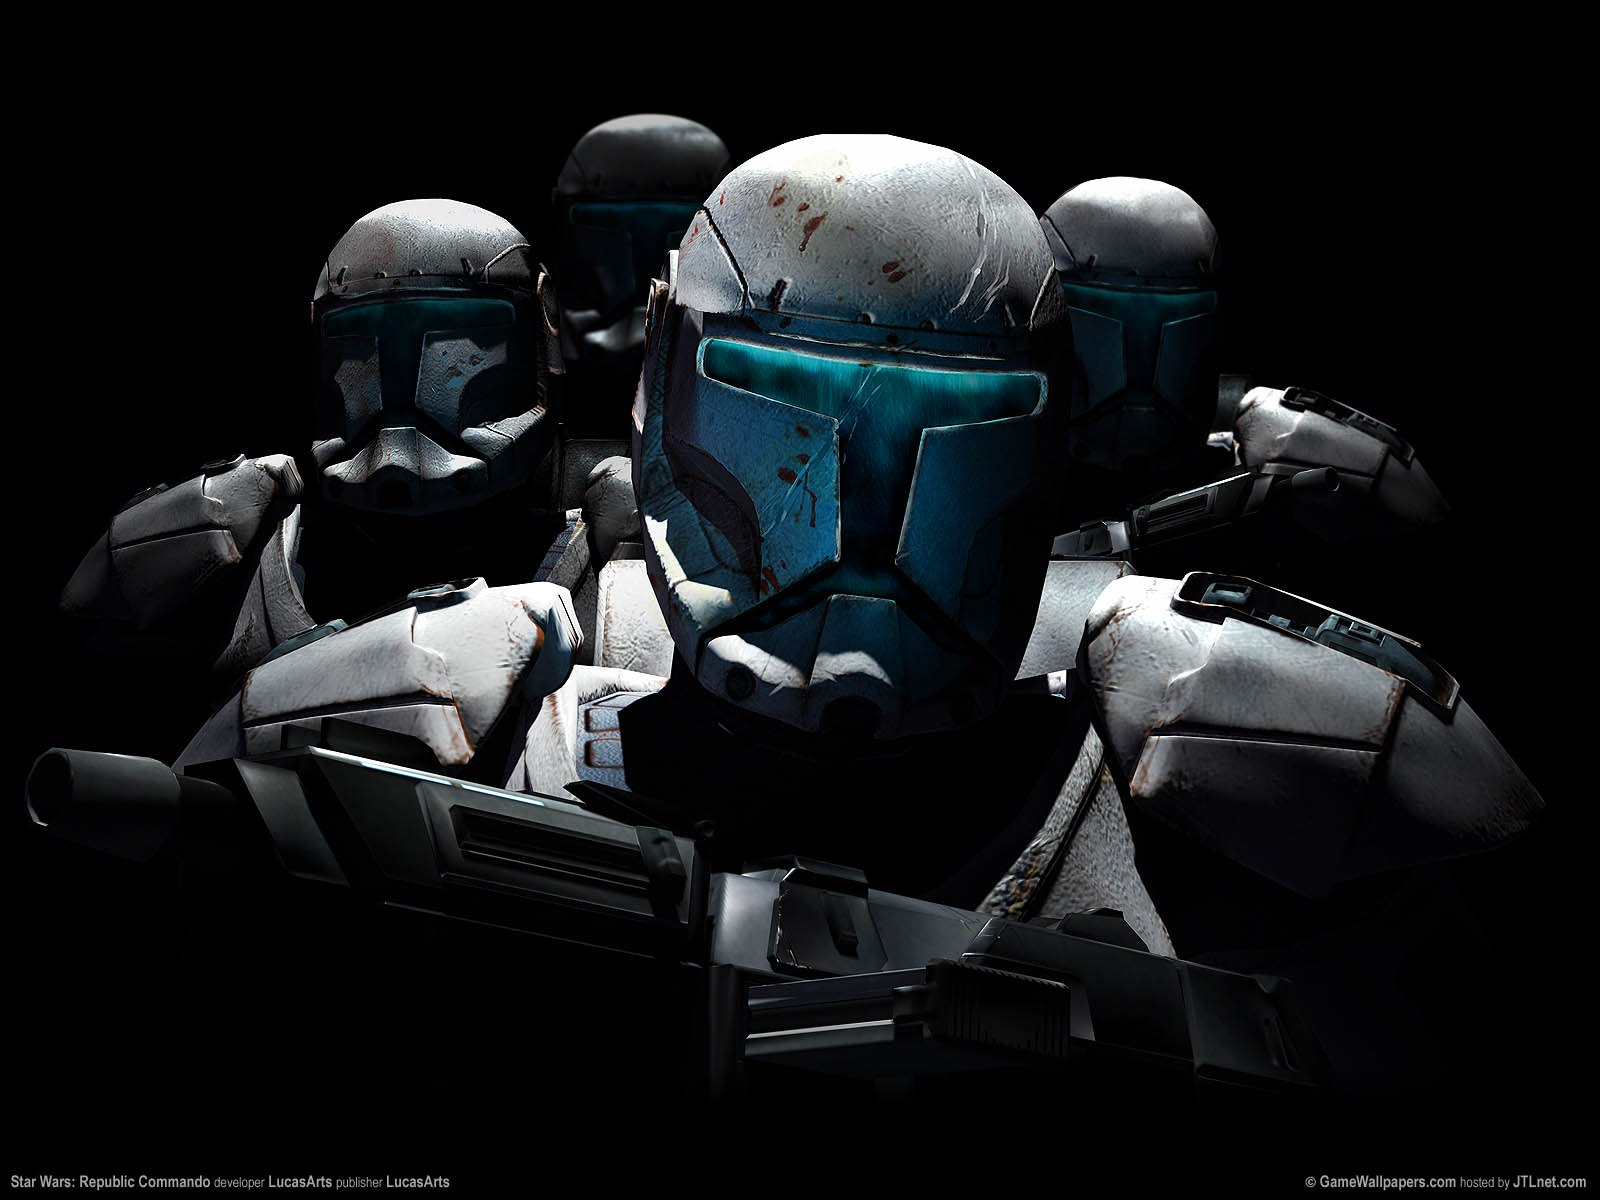 Star wars republic commando order 66 - 6449